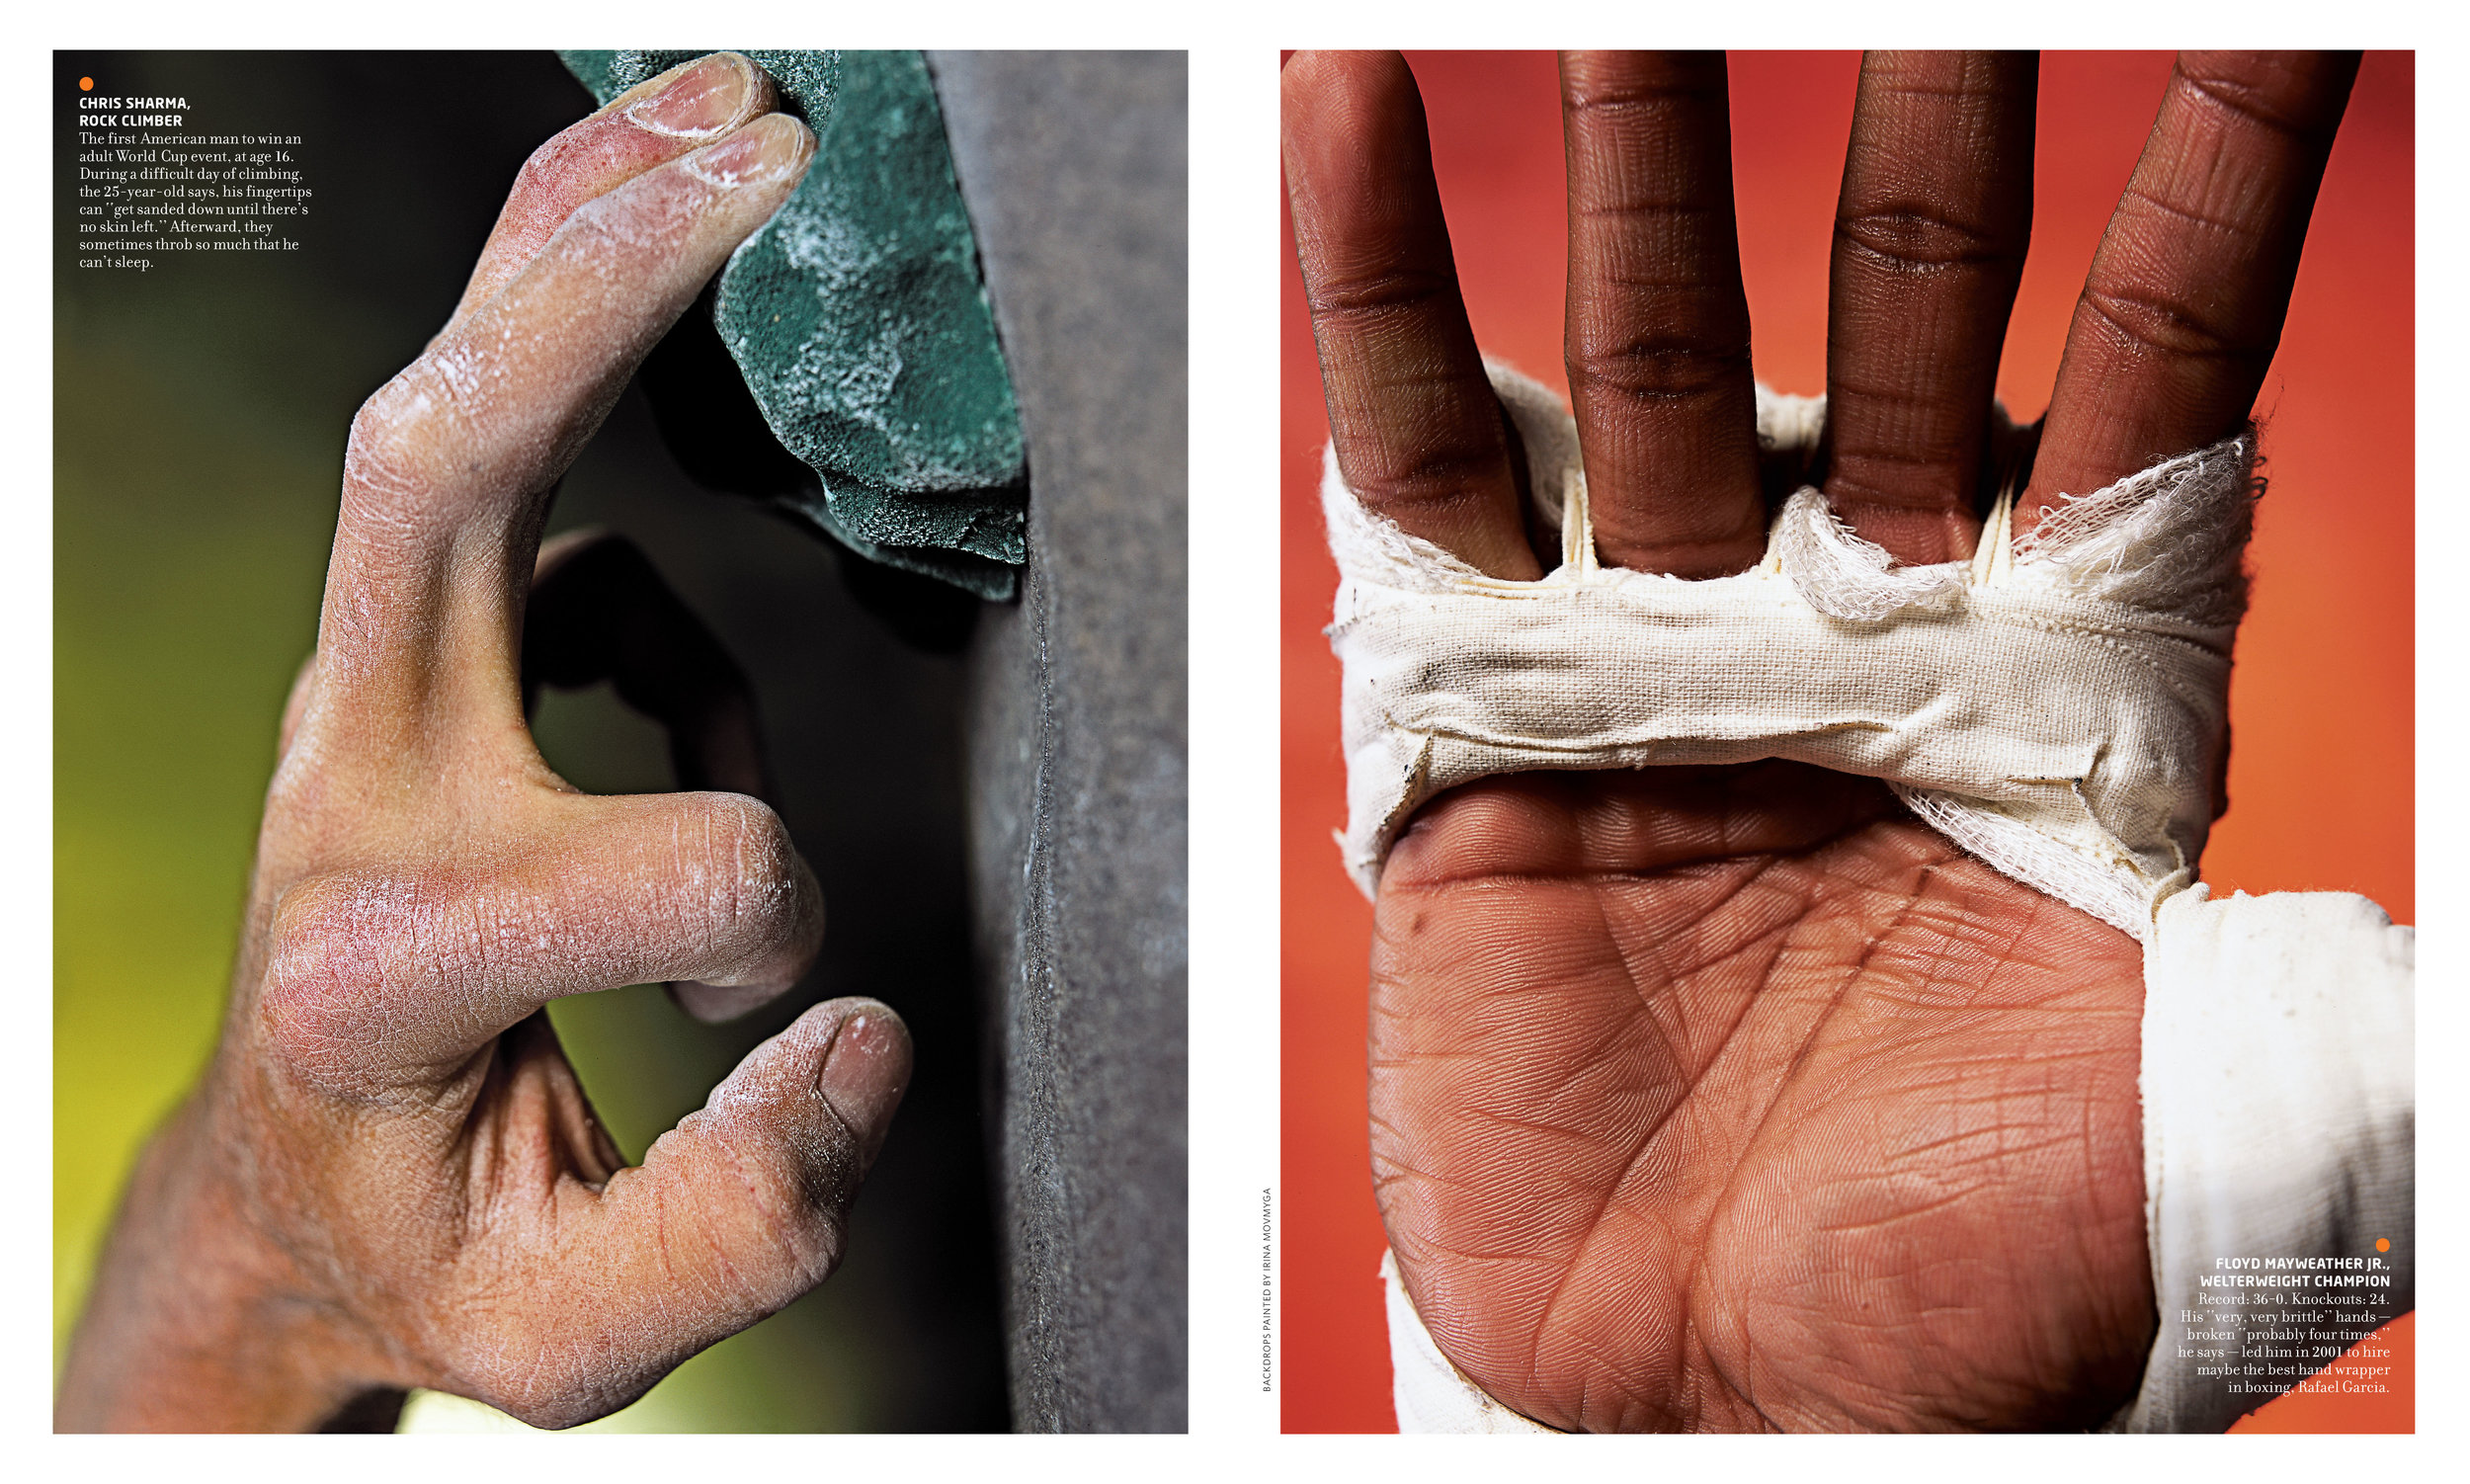 06.04.06.Serrano Hands.jpg